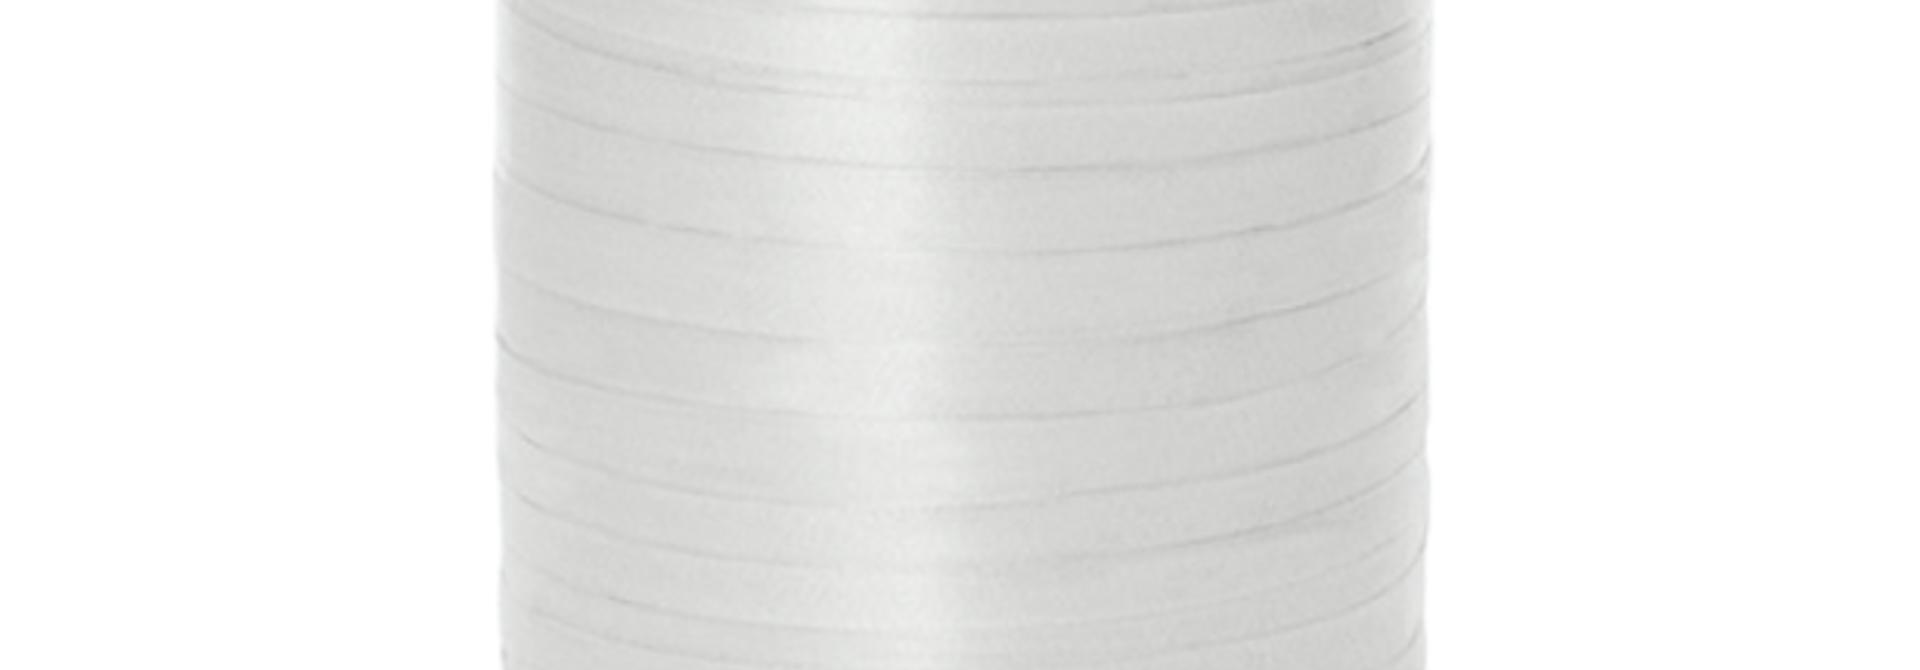 Ballonlint wit 5 mm (500 m)